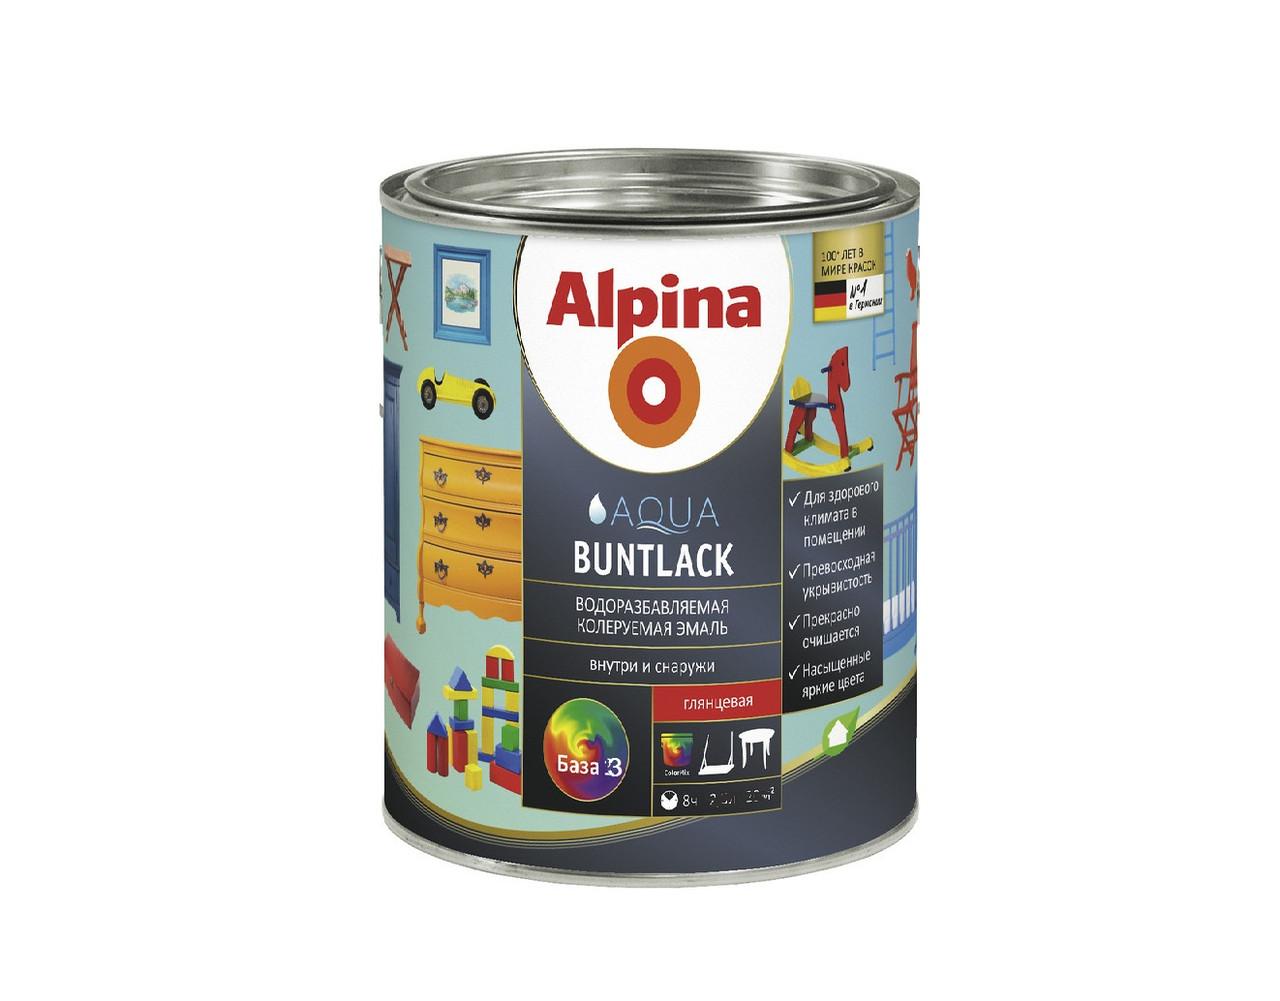 Фото краски Alpina Aqua Buntlack